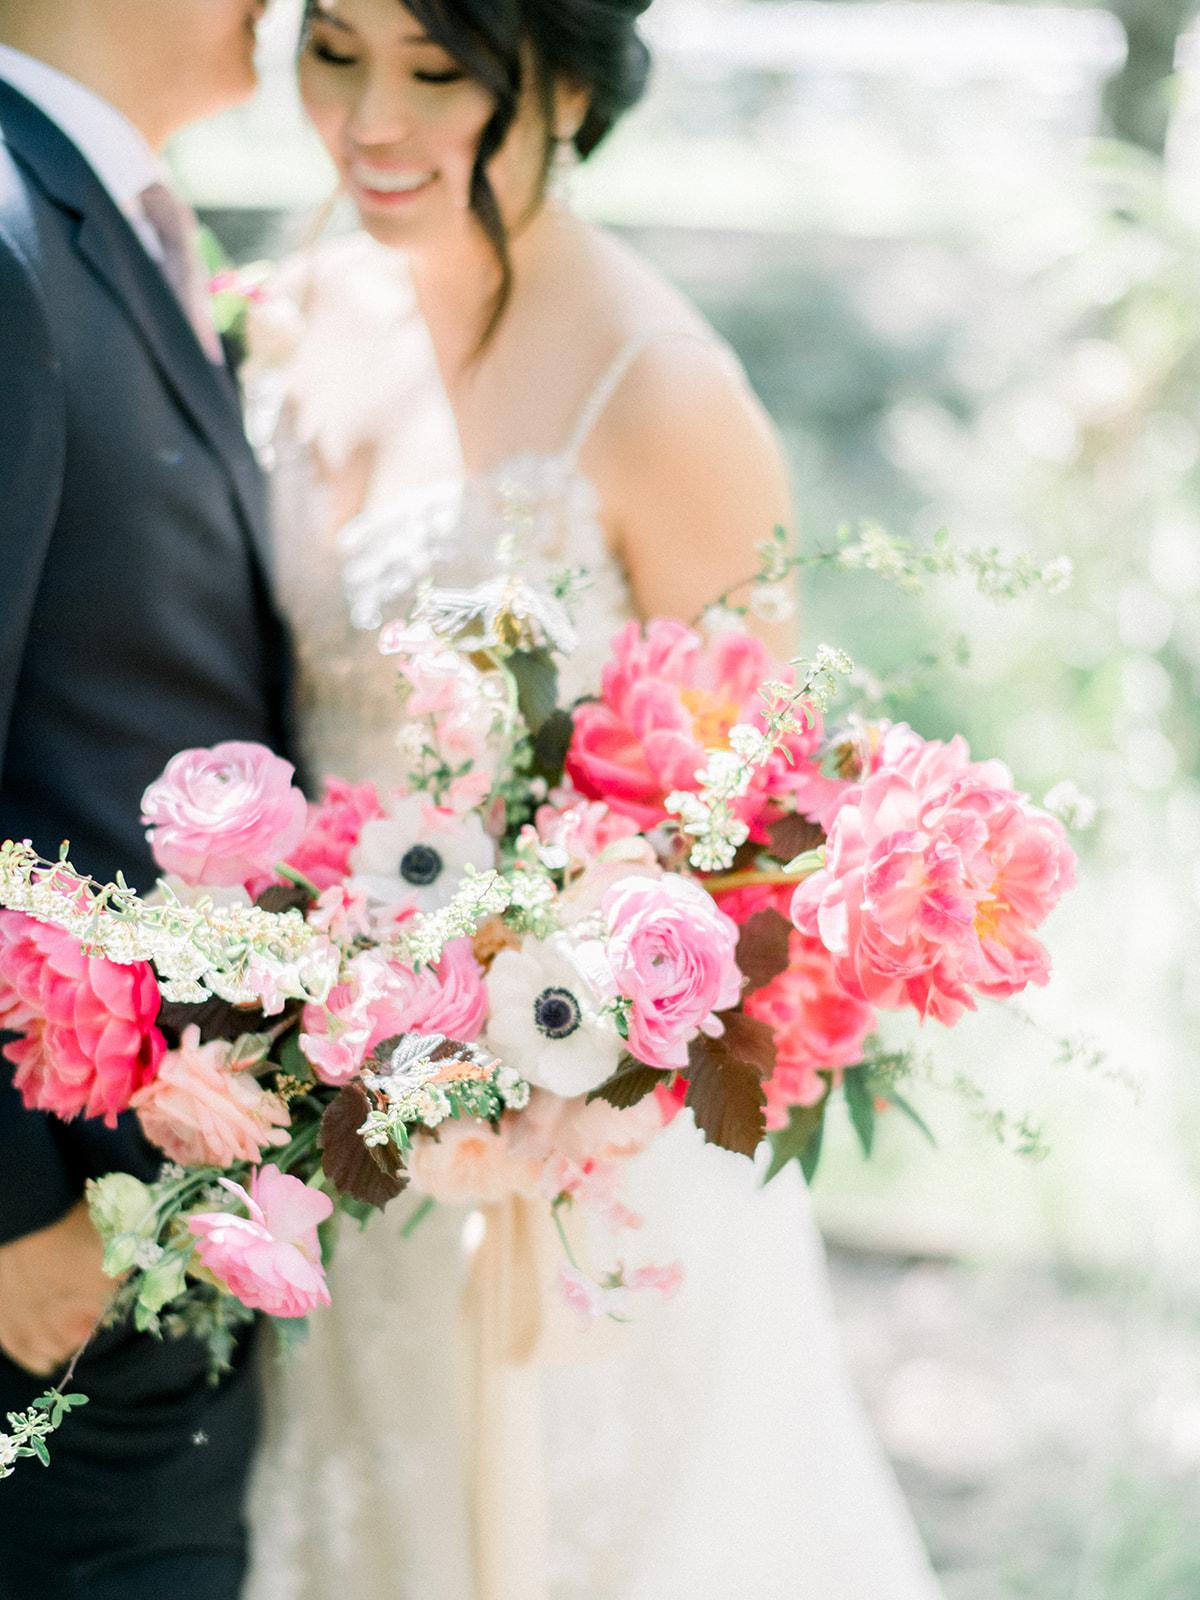 jueunandjon-etherandsmith-wedding-298.jpg